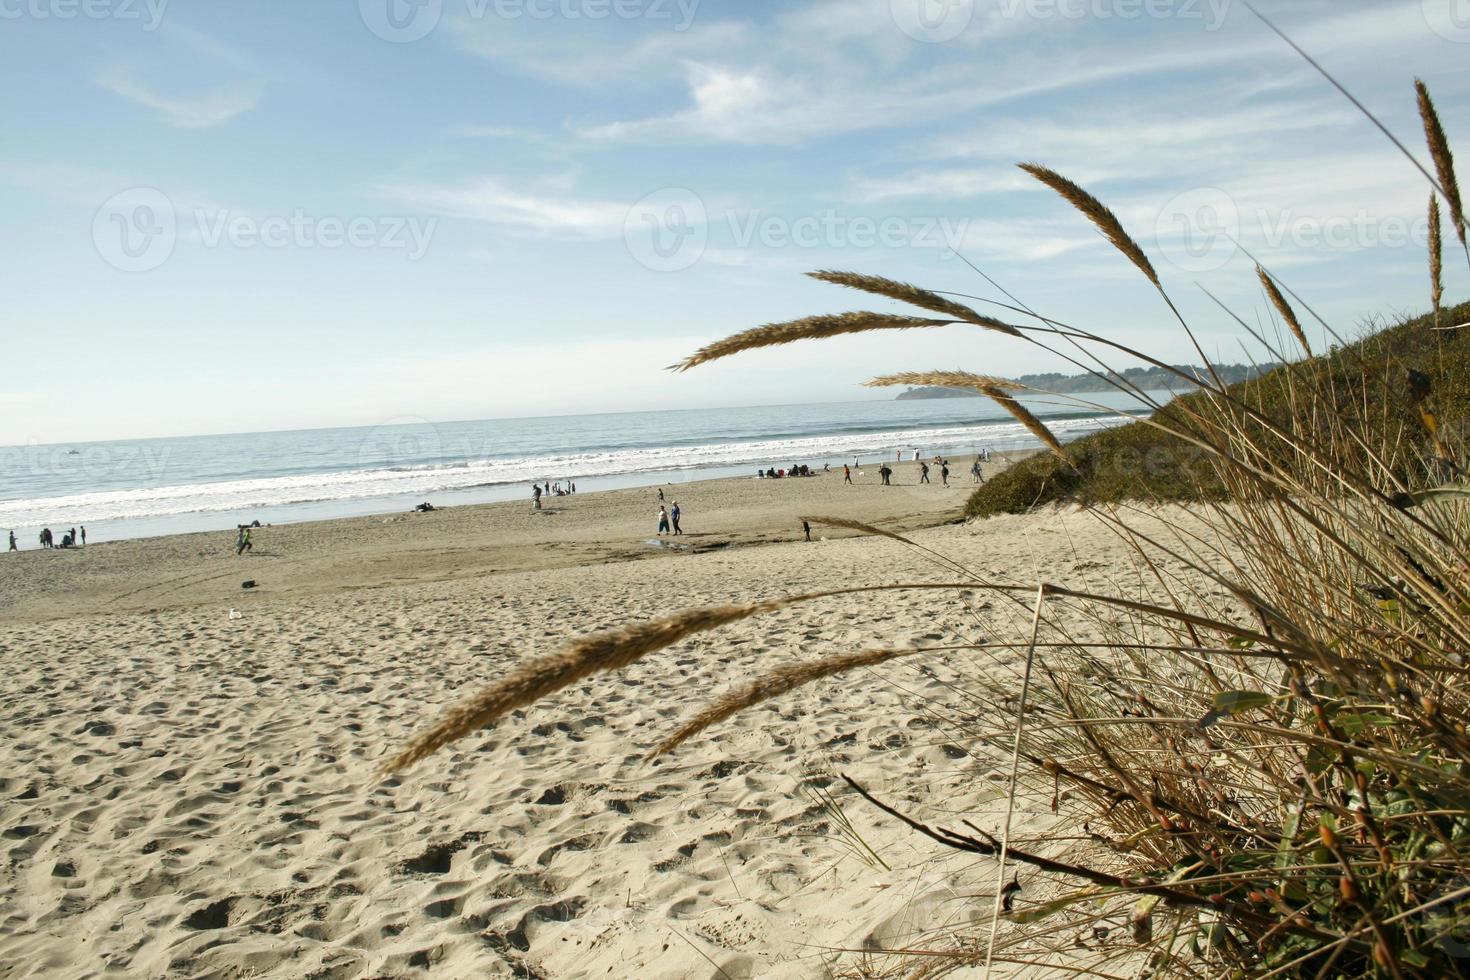 Stinson Beach - turism skott foto